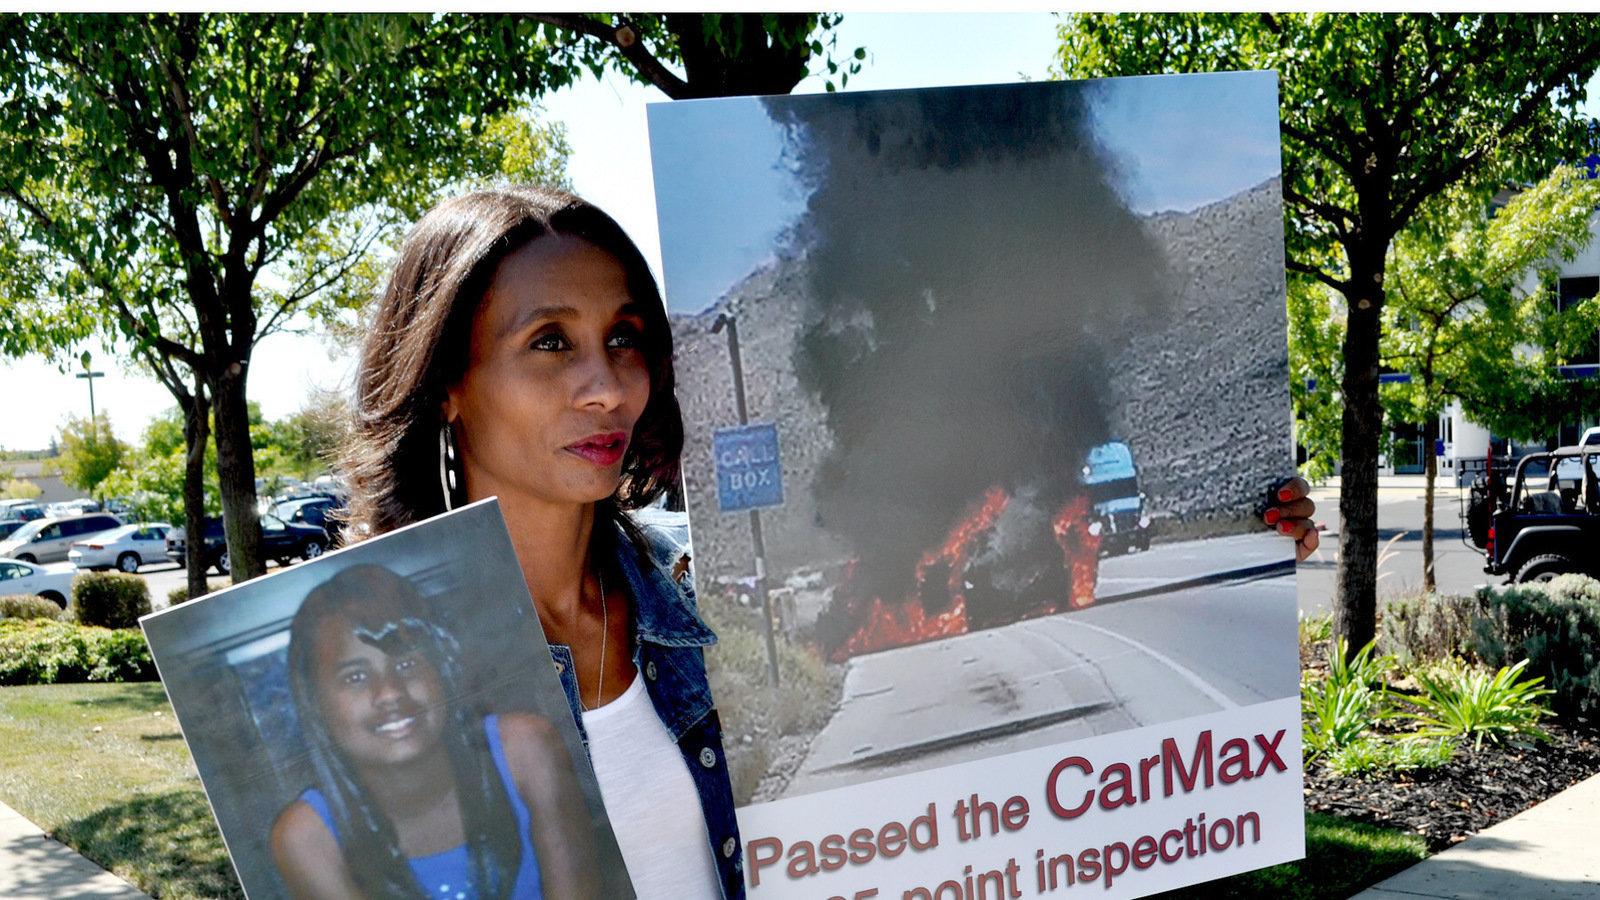 Petition Update Carmax In News Again Selling Dangerous Recalled